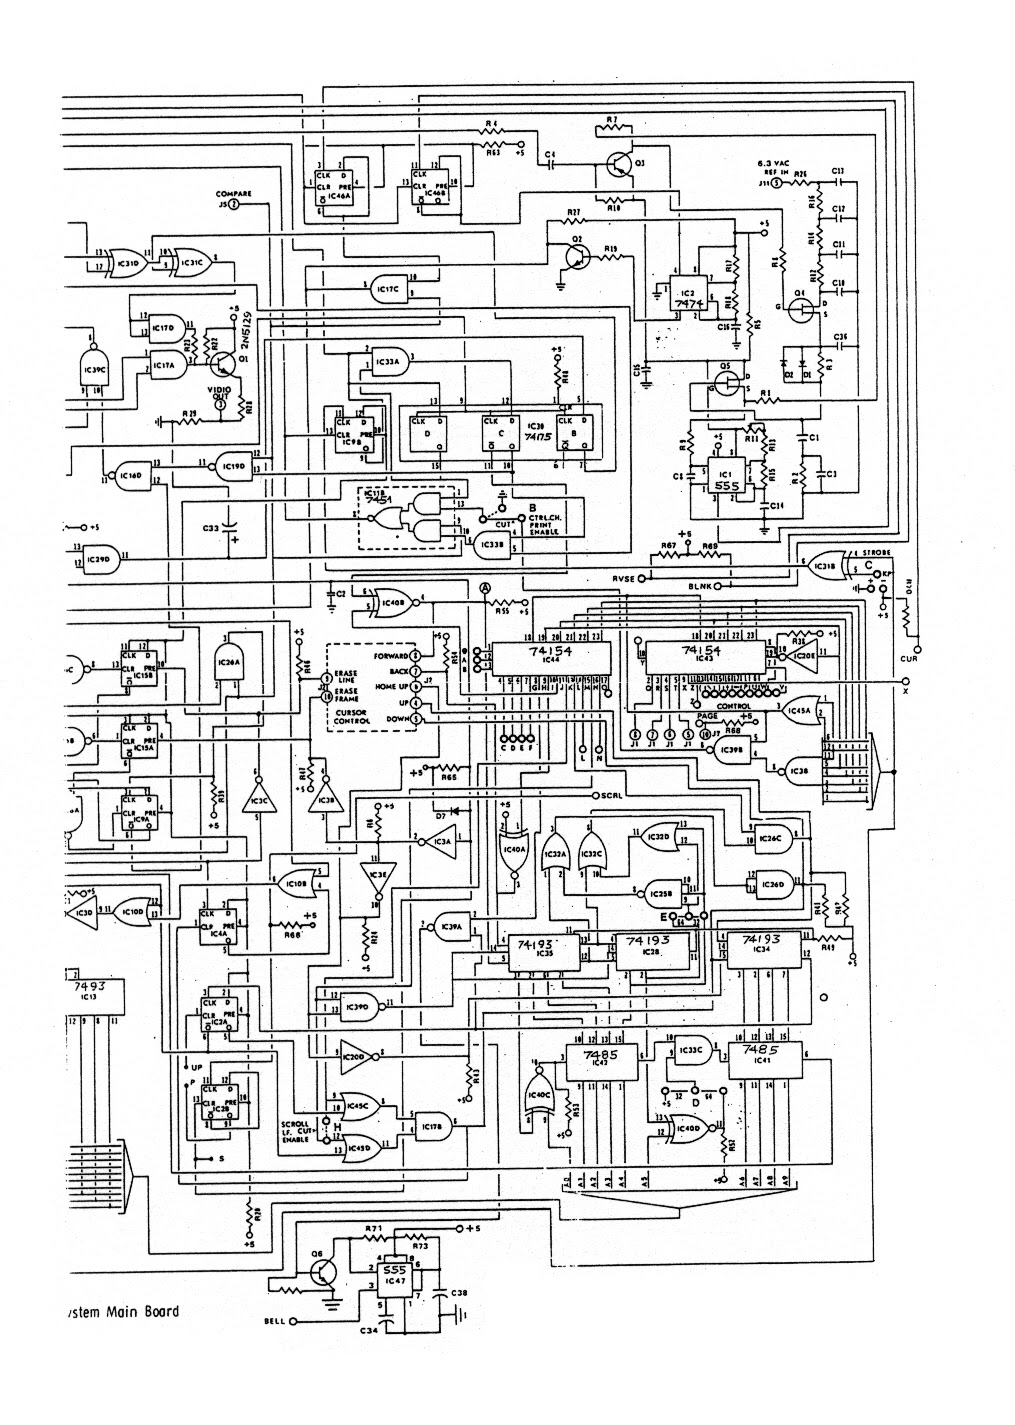 2000 International 4700 Starter Wiring Diagram